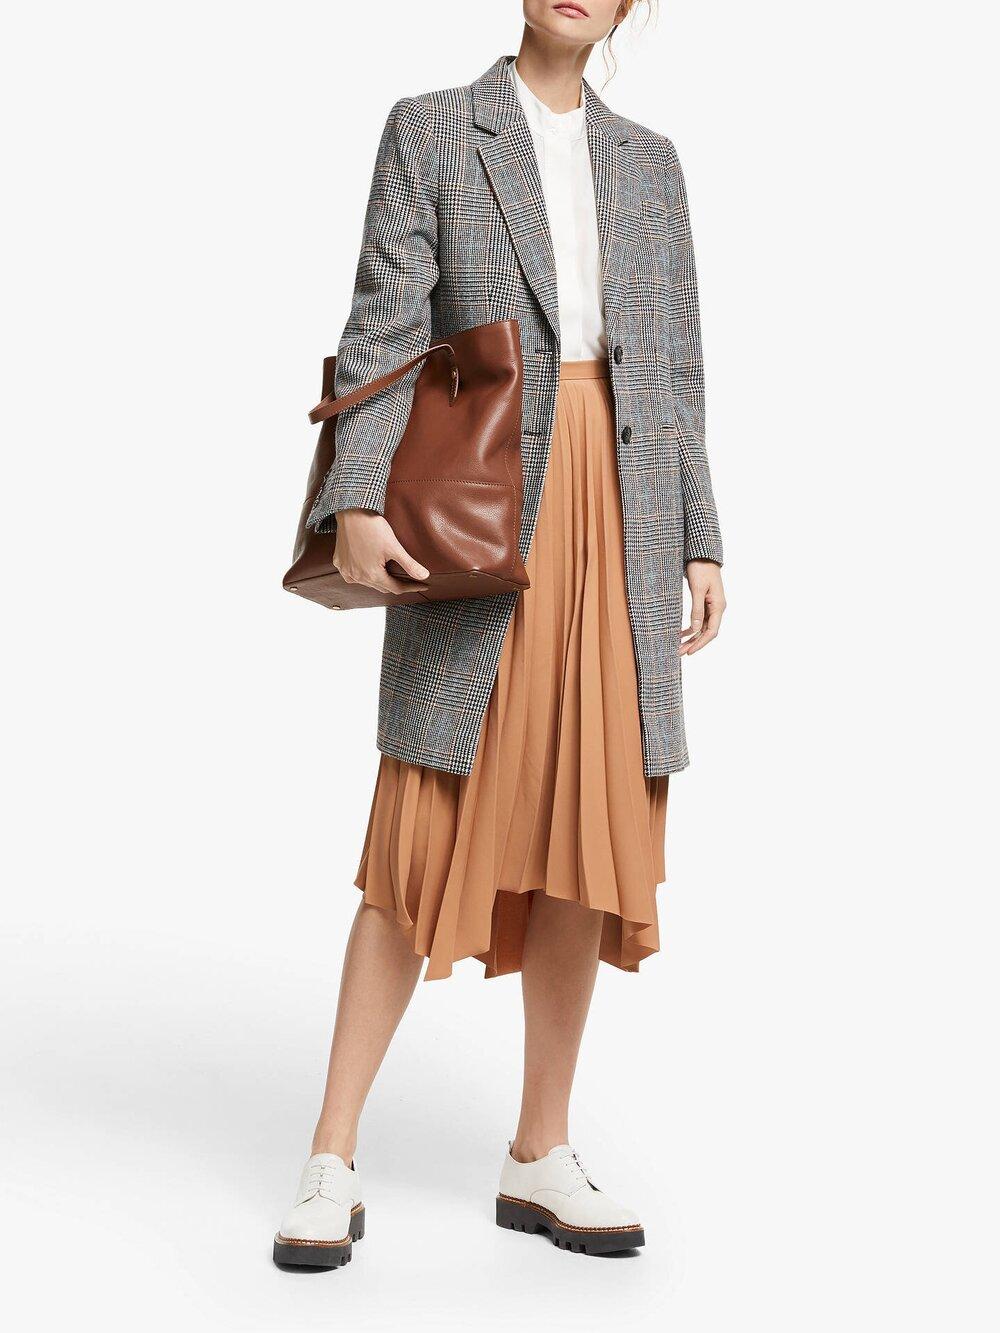 John Lewis & Partners Leather Smart Set Tote Bag